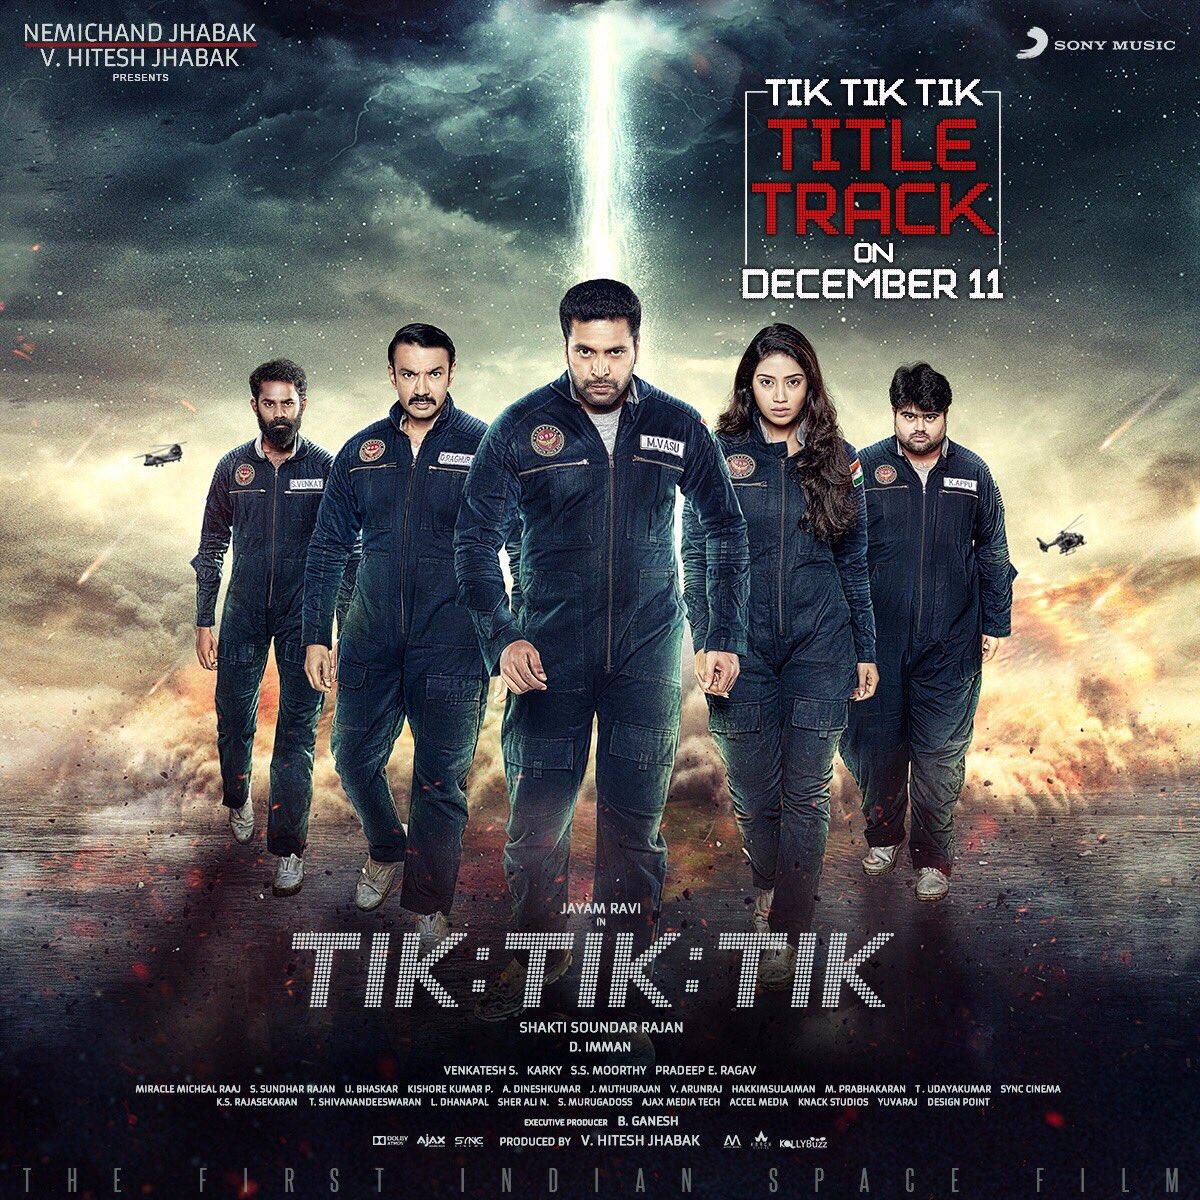 #TikTikTikTitleTrack from December 11th! Stay Glued! @actor_jayamravi @NPethuraj @ShaktiRajan @JabaksMovies @thisisysr @iamyogib @SunithaSarathy @madhankarky @SonyMusicSouth Praise God!